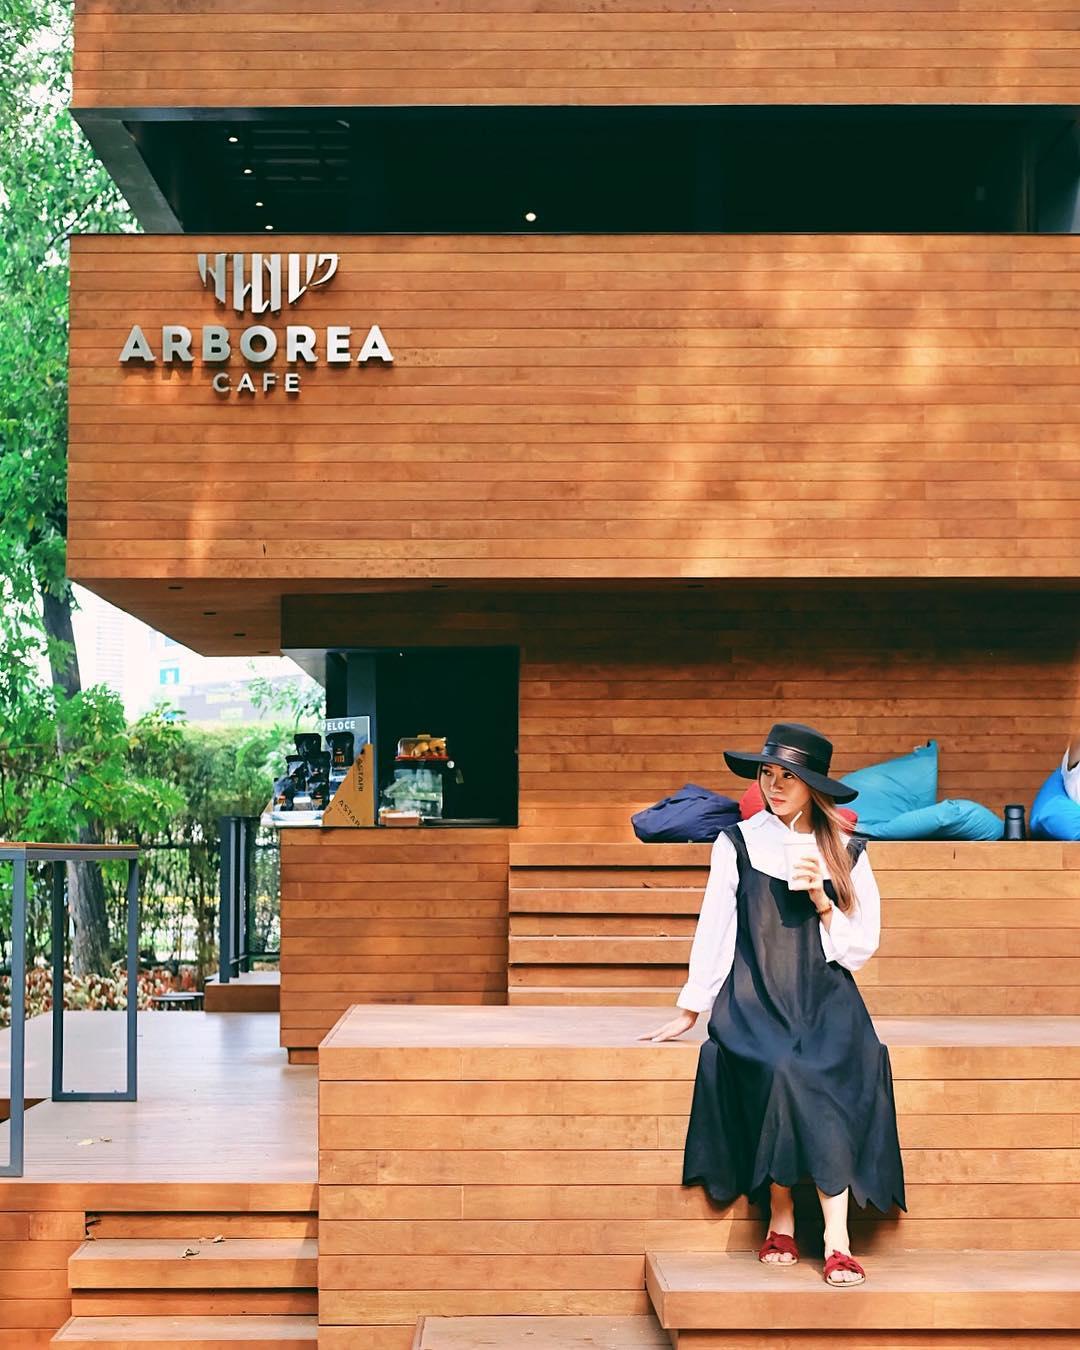 Arborea Cafe, Konsep Arborea Cafe | Anak Kota